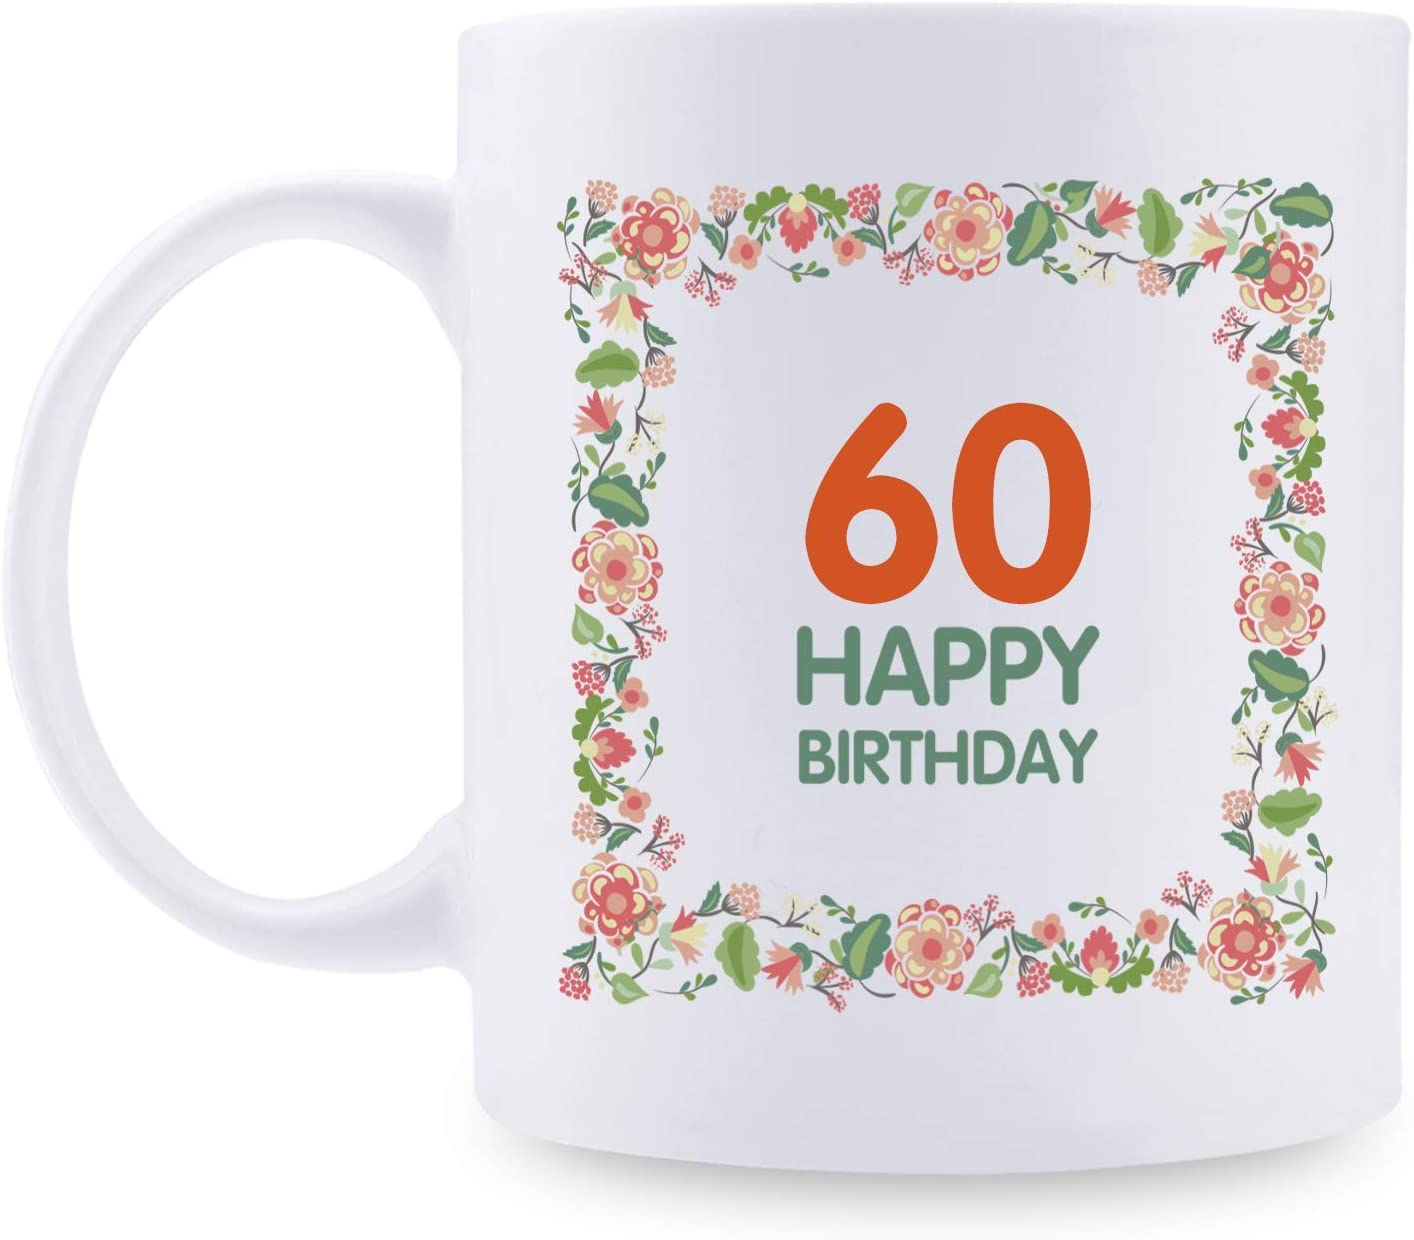 60th Birthday Gifts for Women - 1959 Birthday Gifts for Women, 60 Years Old Birthday Gifts Taza de café para mamá, esposa, amiga, hermana, ella, colega, compañera de trabajo - Taza de flores